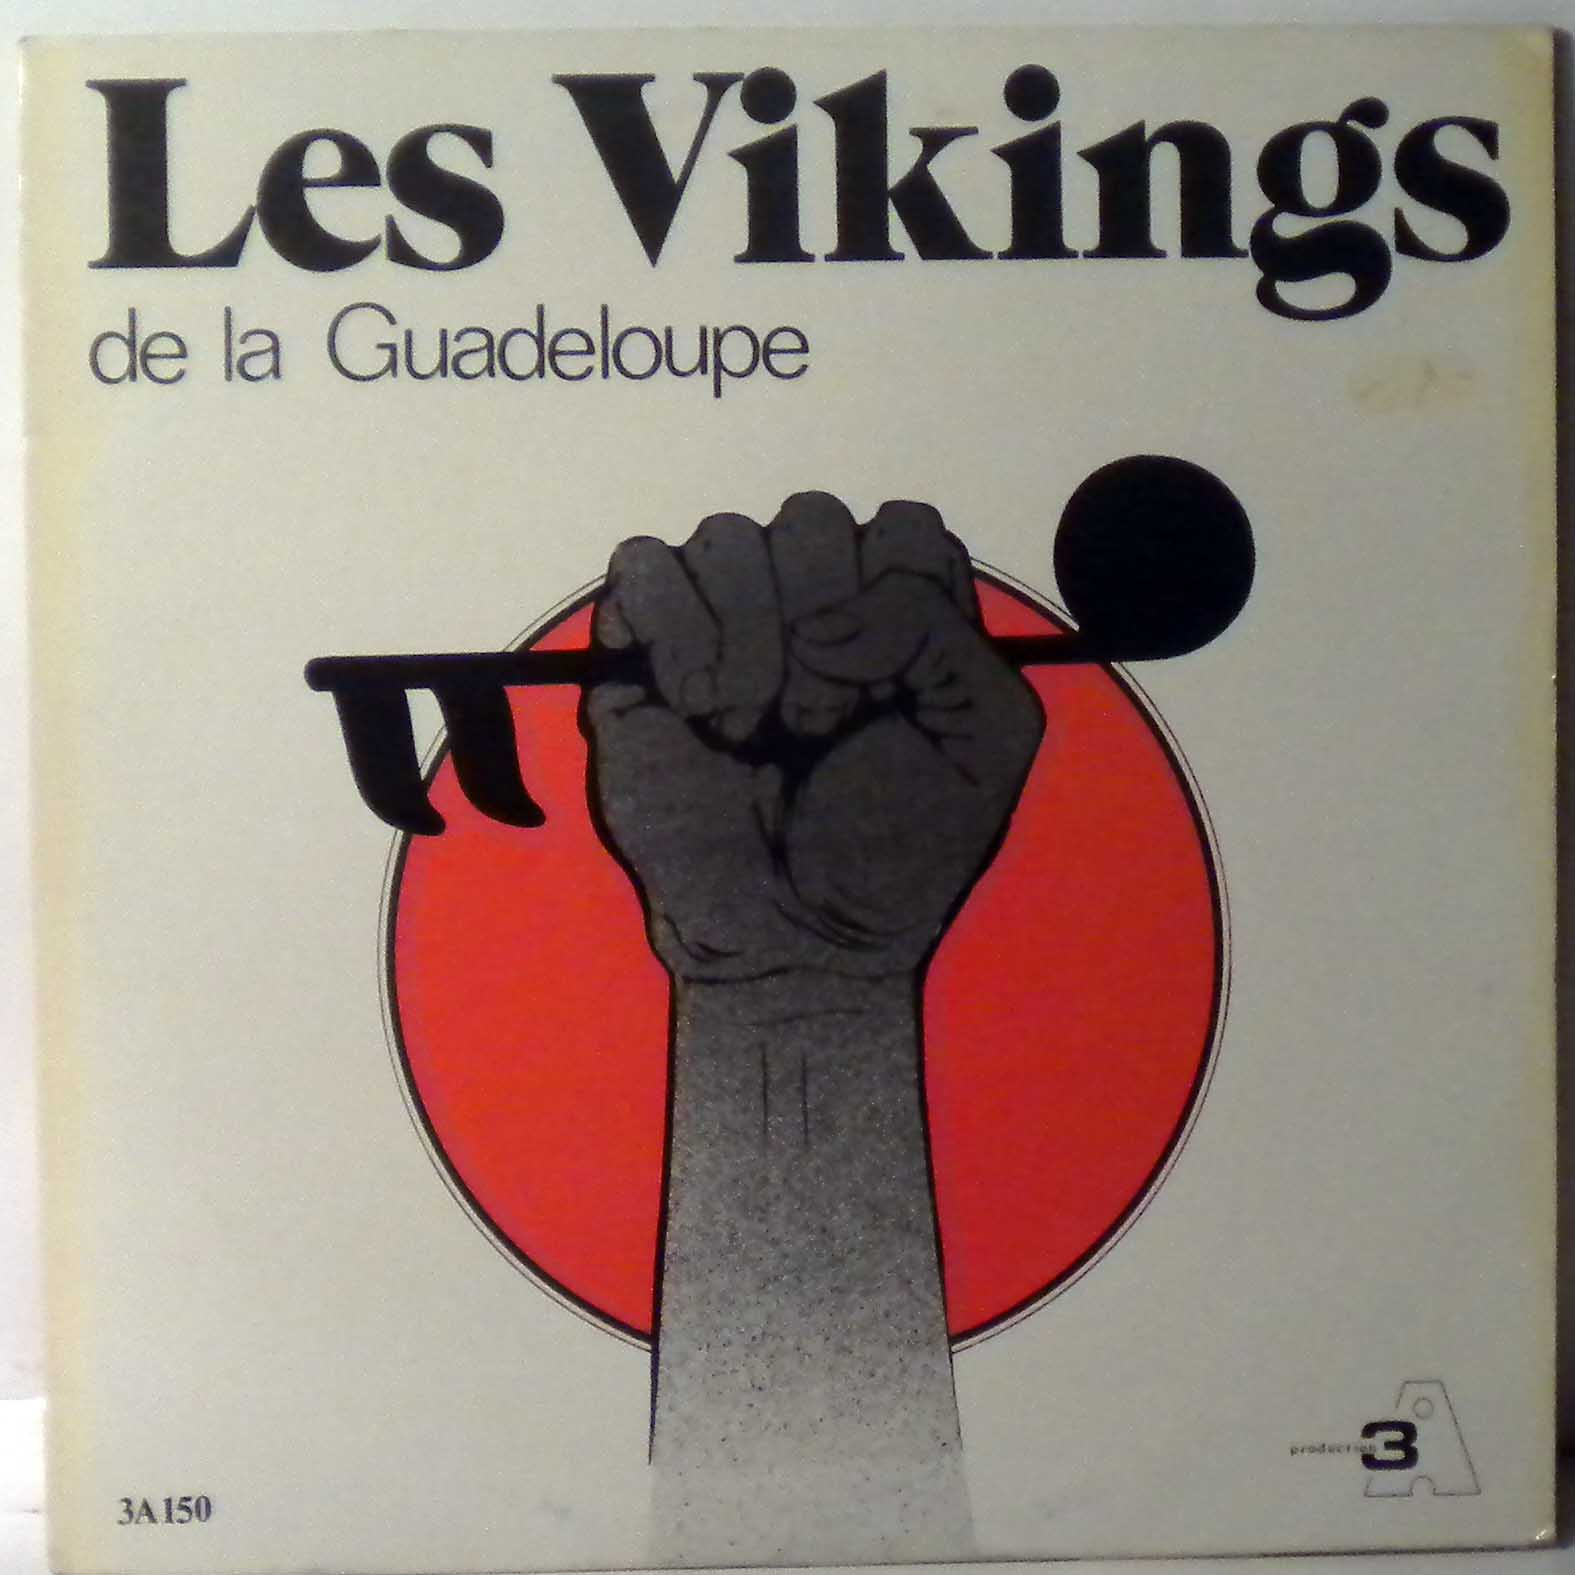 LES VIKINGS DE LA GUADELOUPE - Same - 33T